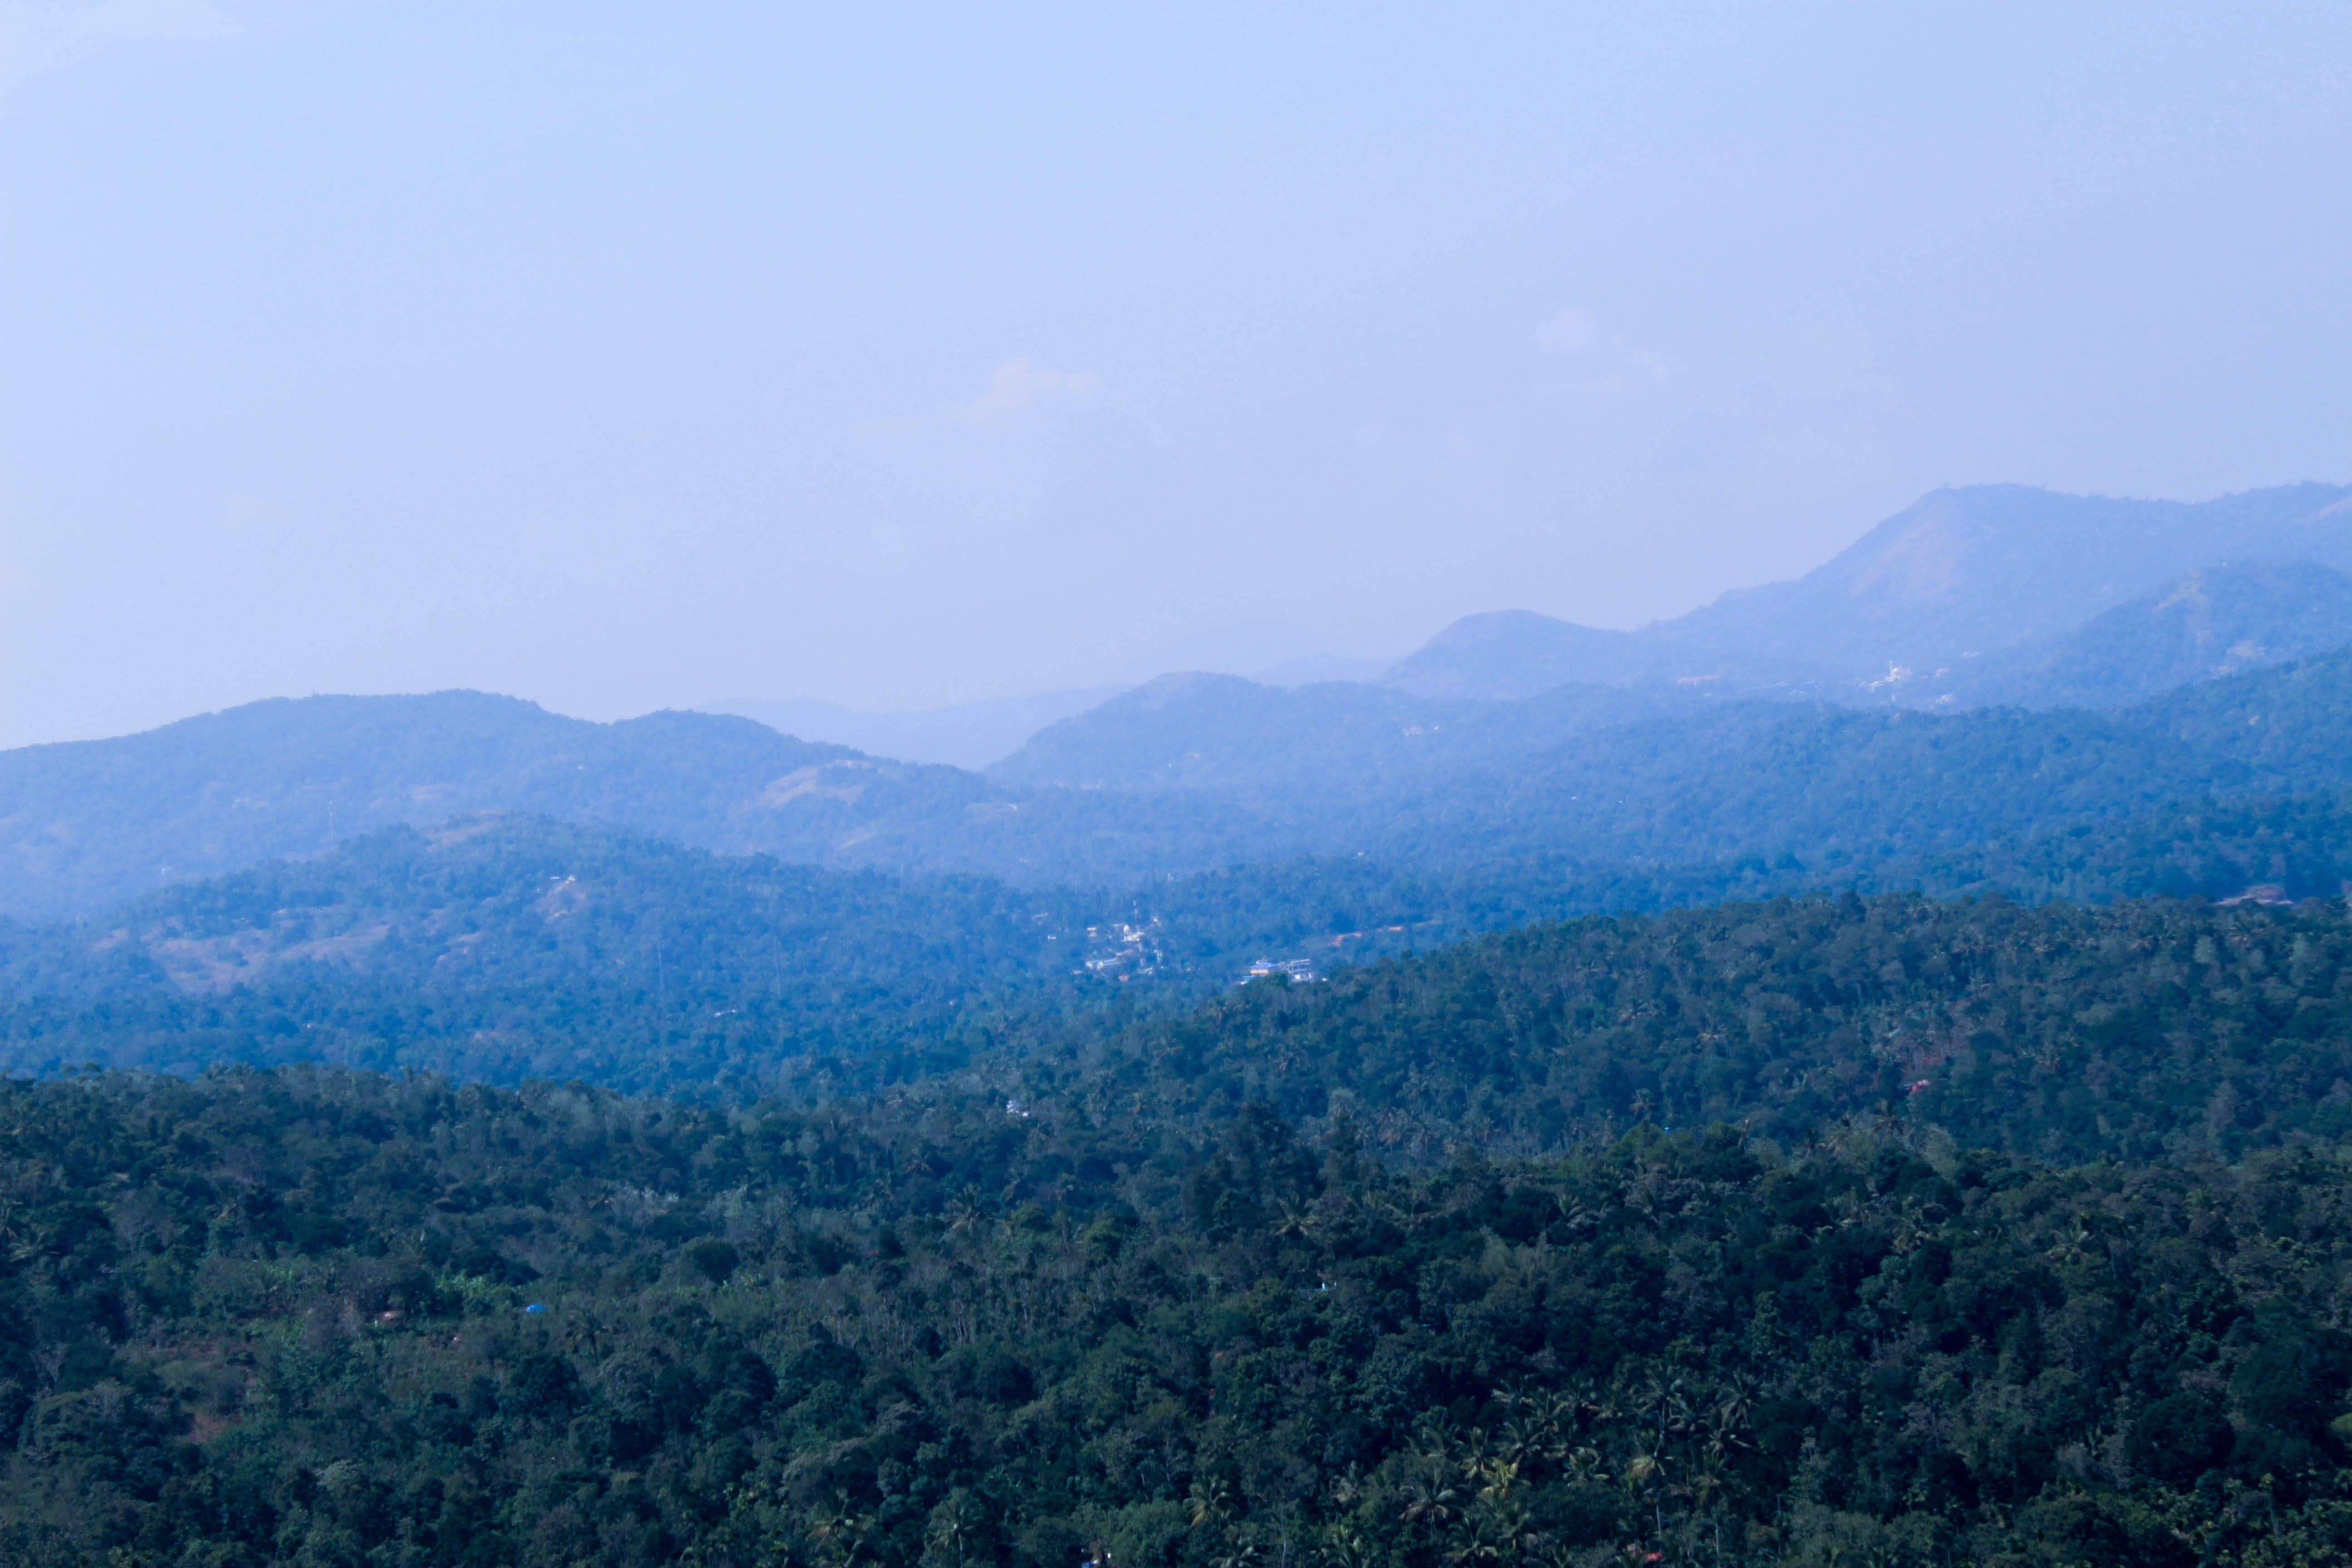 Kostenloses Stock Foto zu abenteuer, blauer himmel, hiil top, landschaften